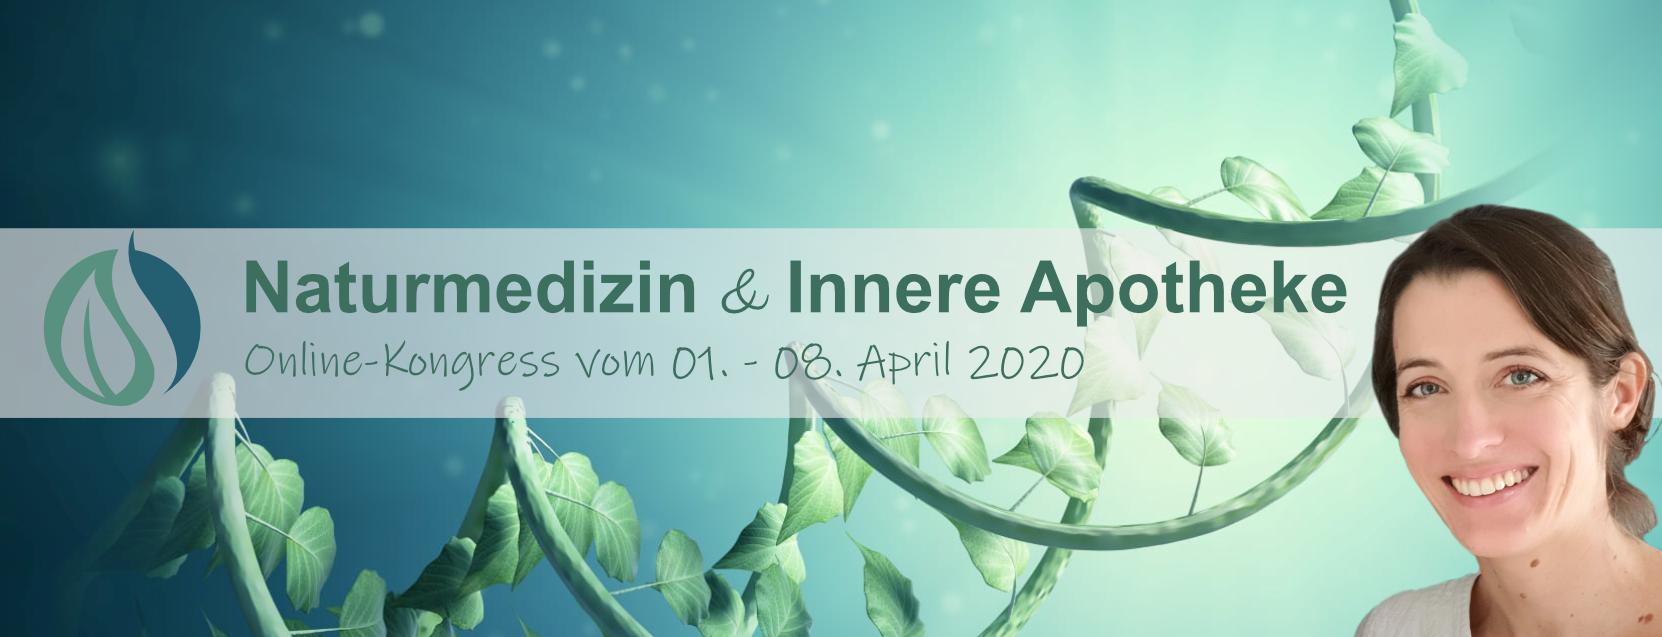 Naturmedizin & Innere Apotheke Online-Kongress 2020